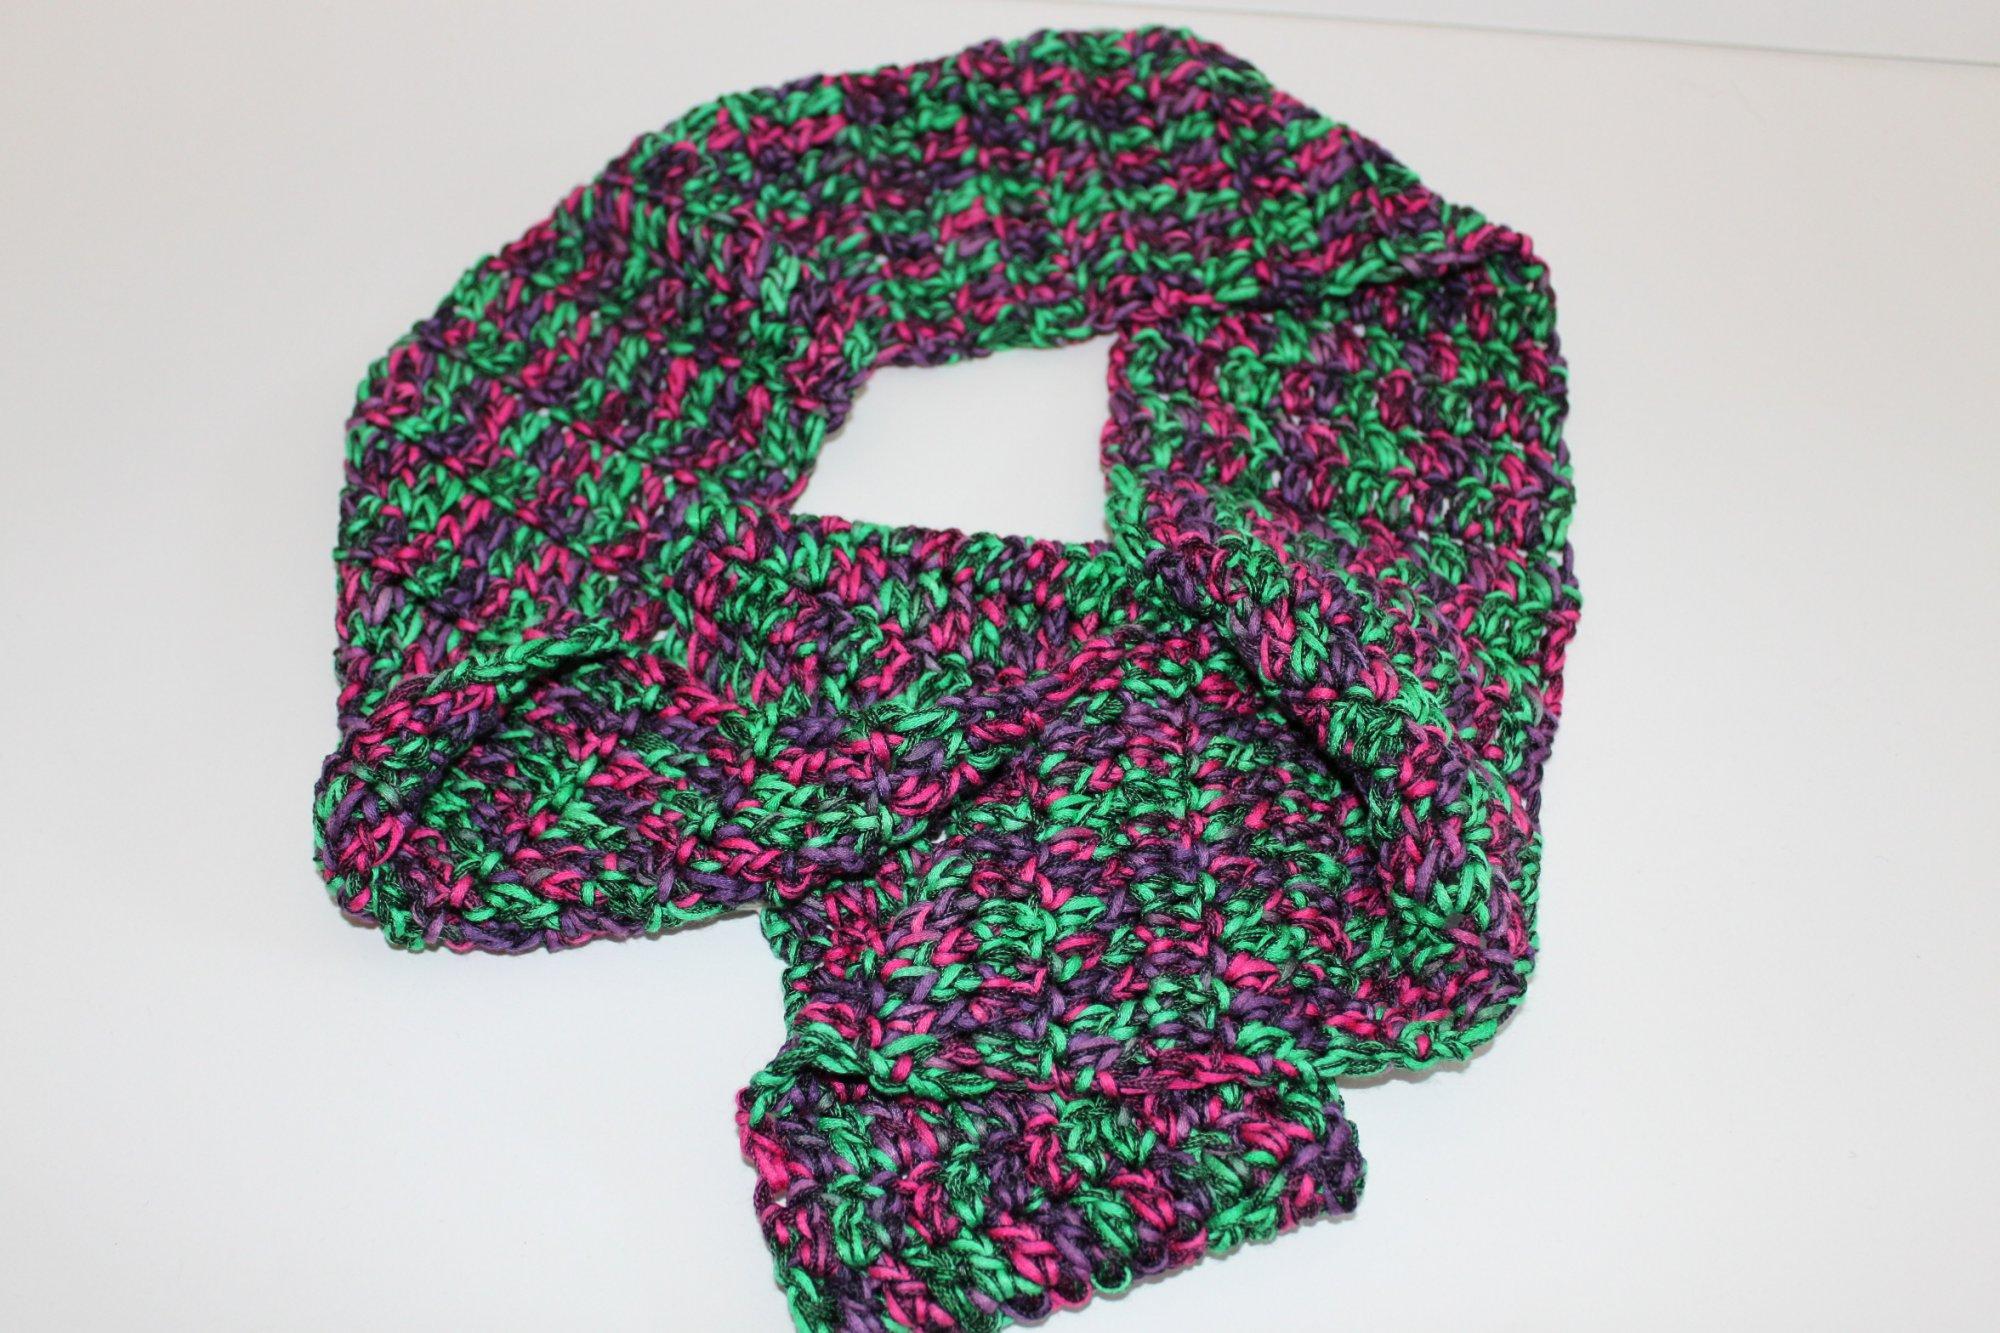 Purple/Green/Black Ribbon Infinity Scarf